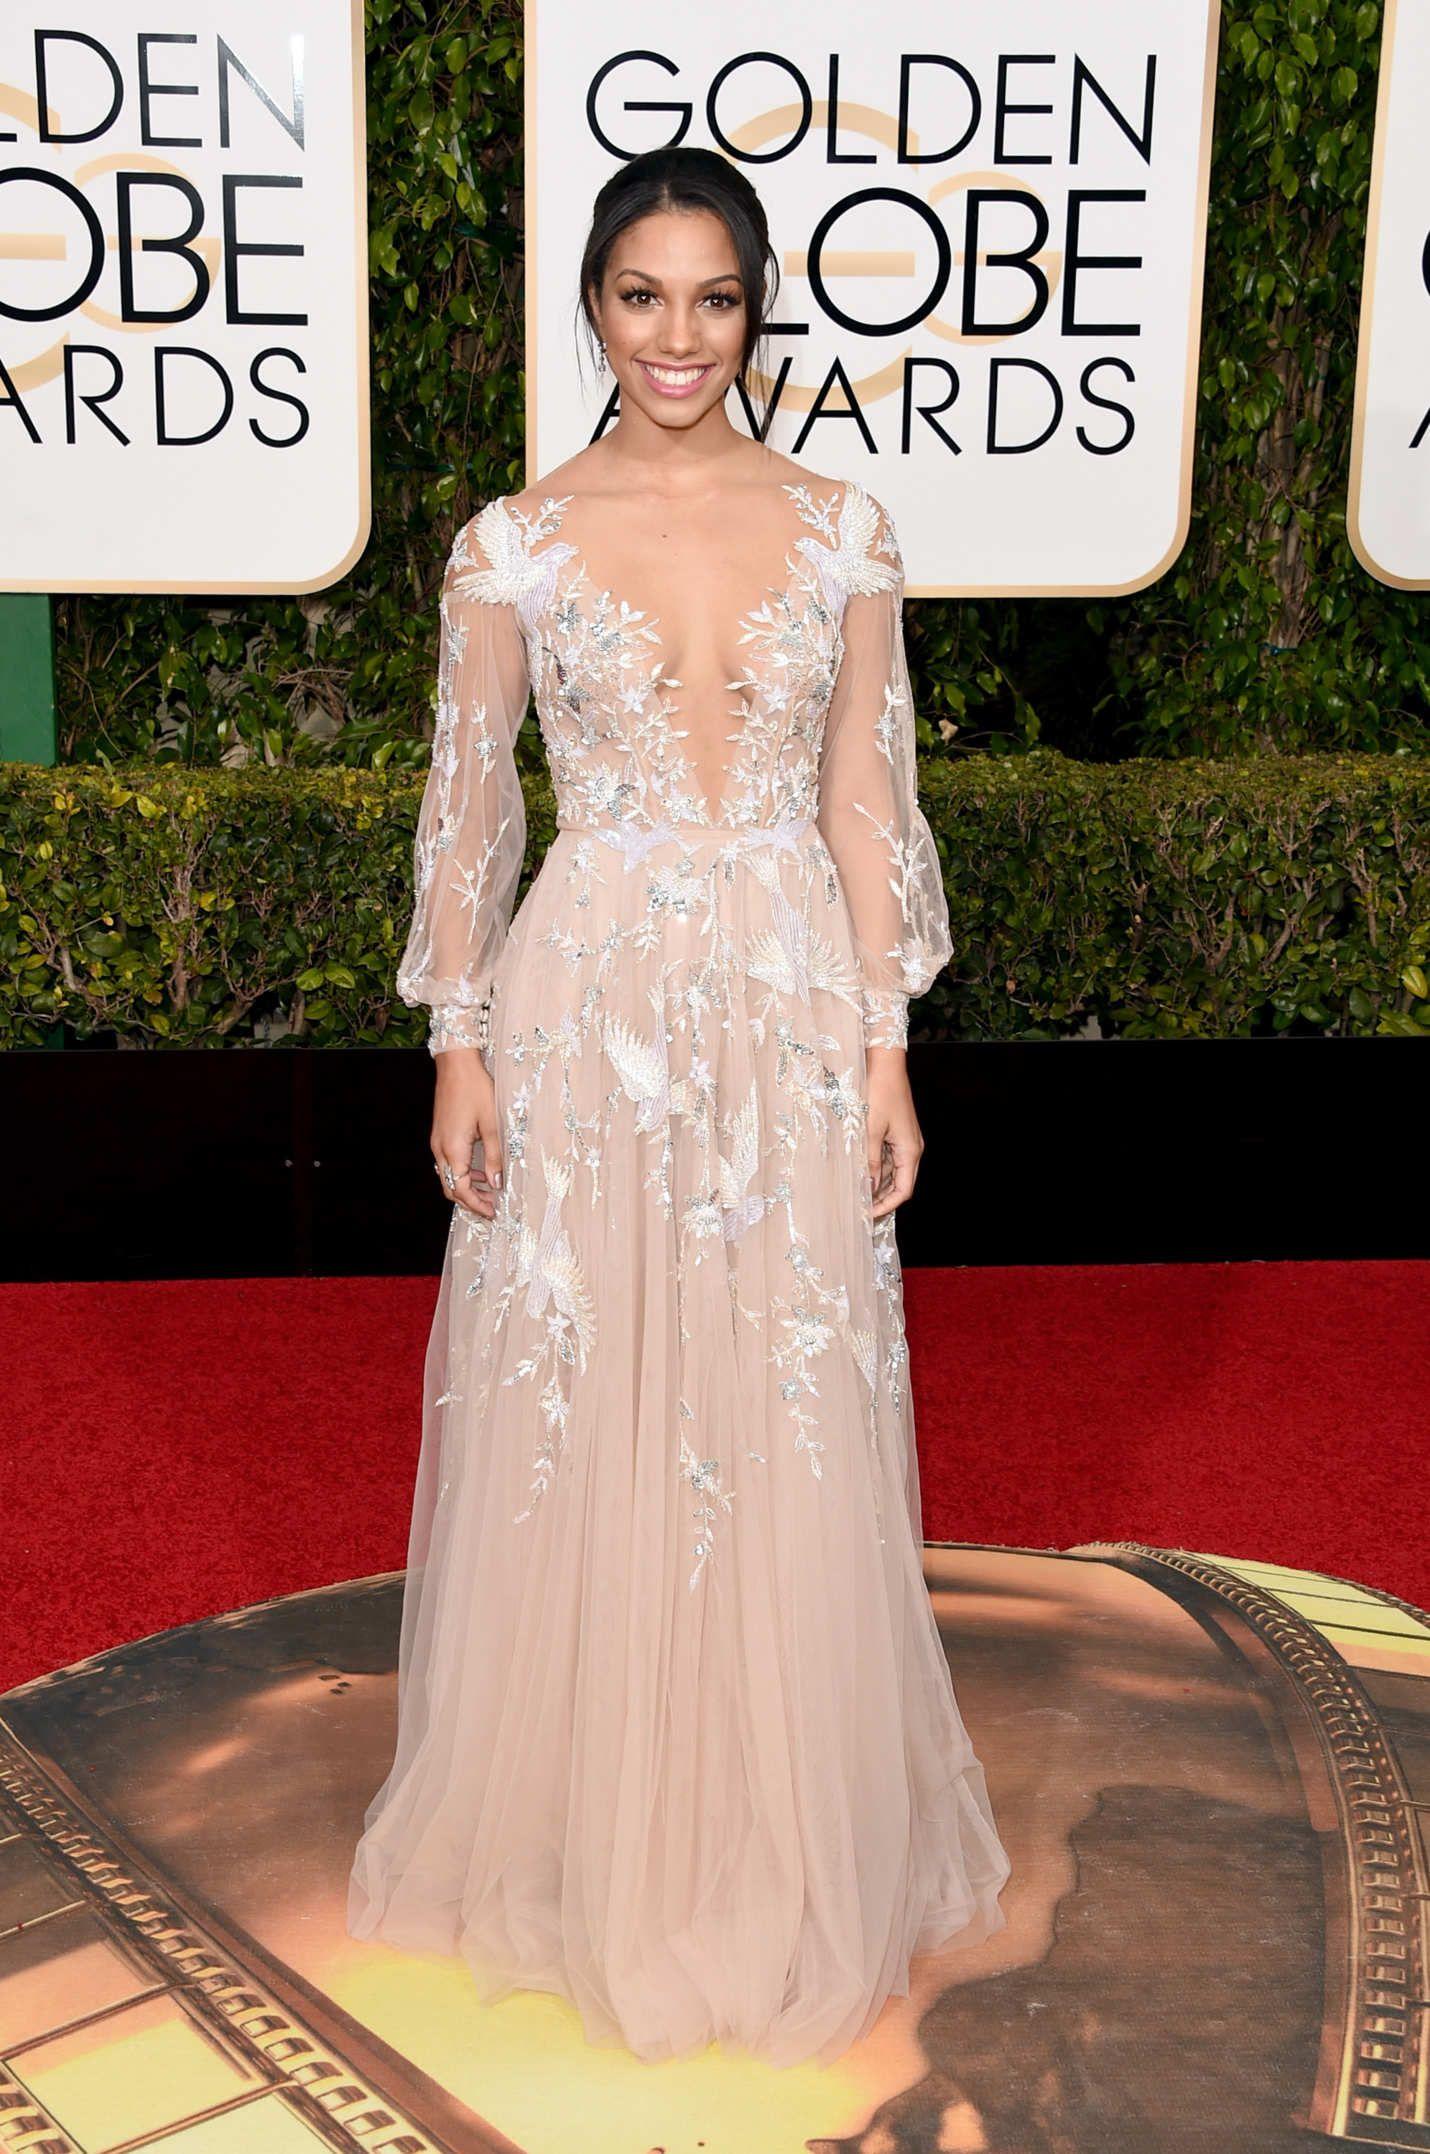 Miss Golden Globe Corinne Foxx. 2016 Golden Globes